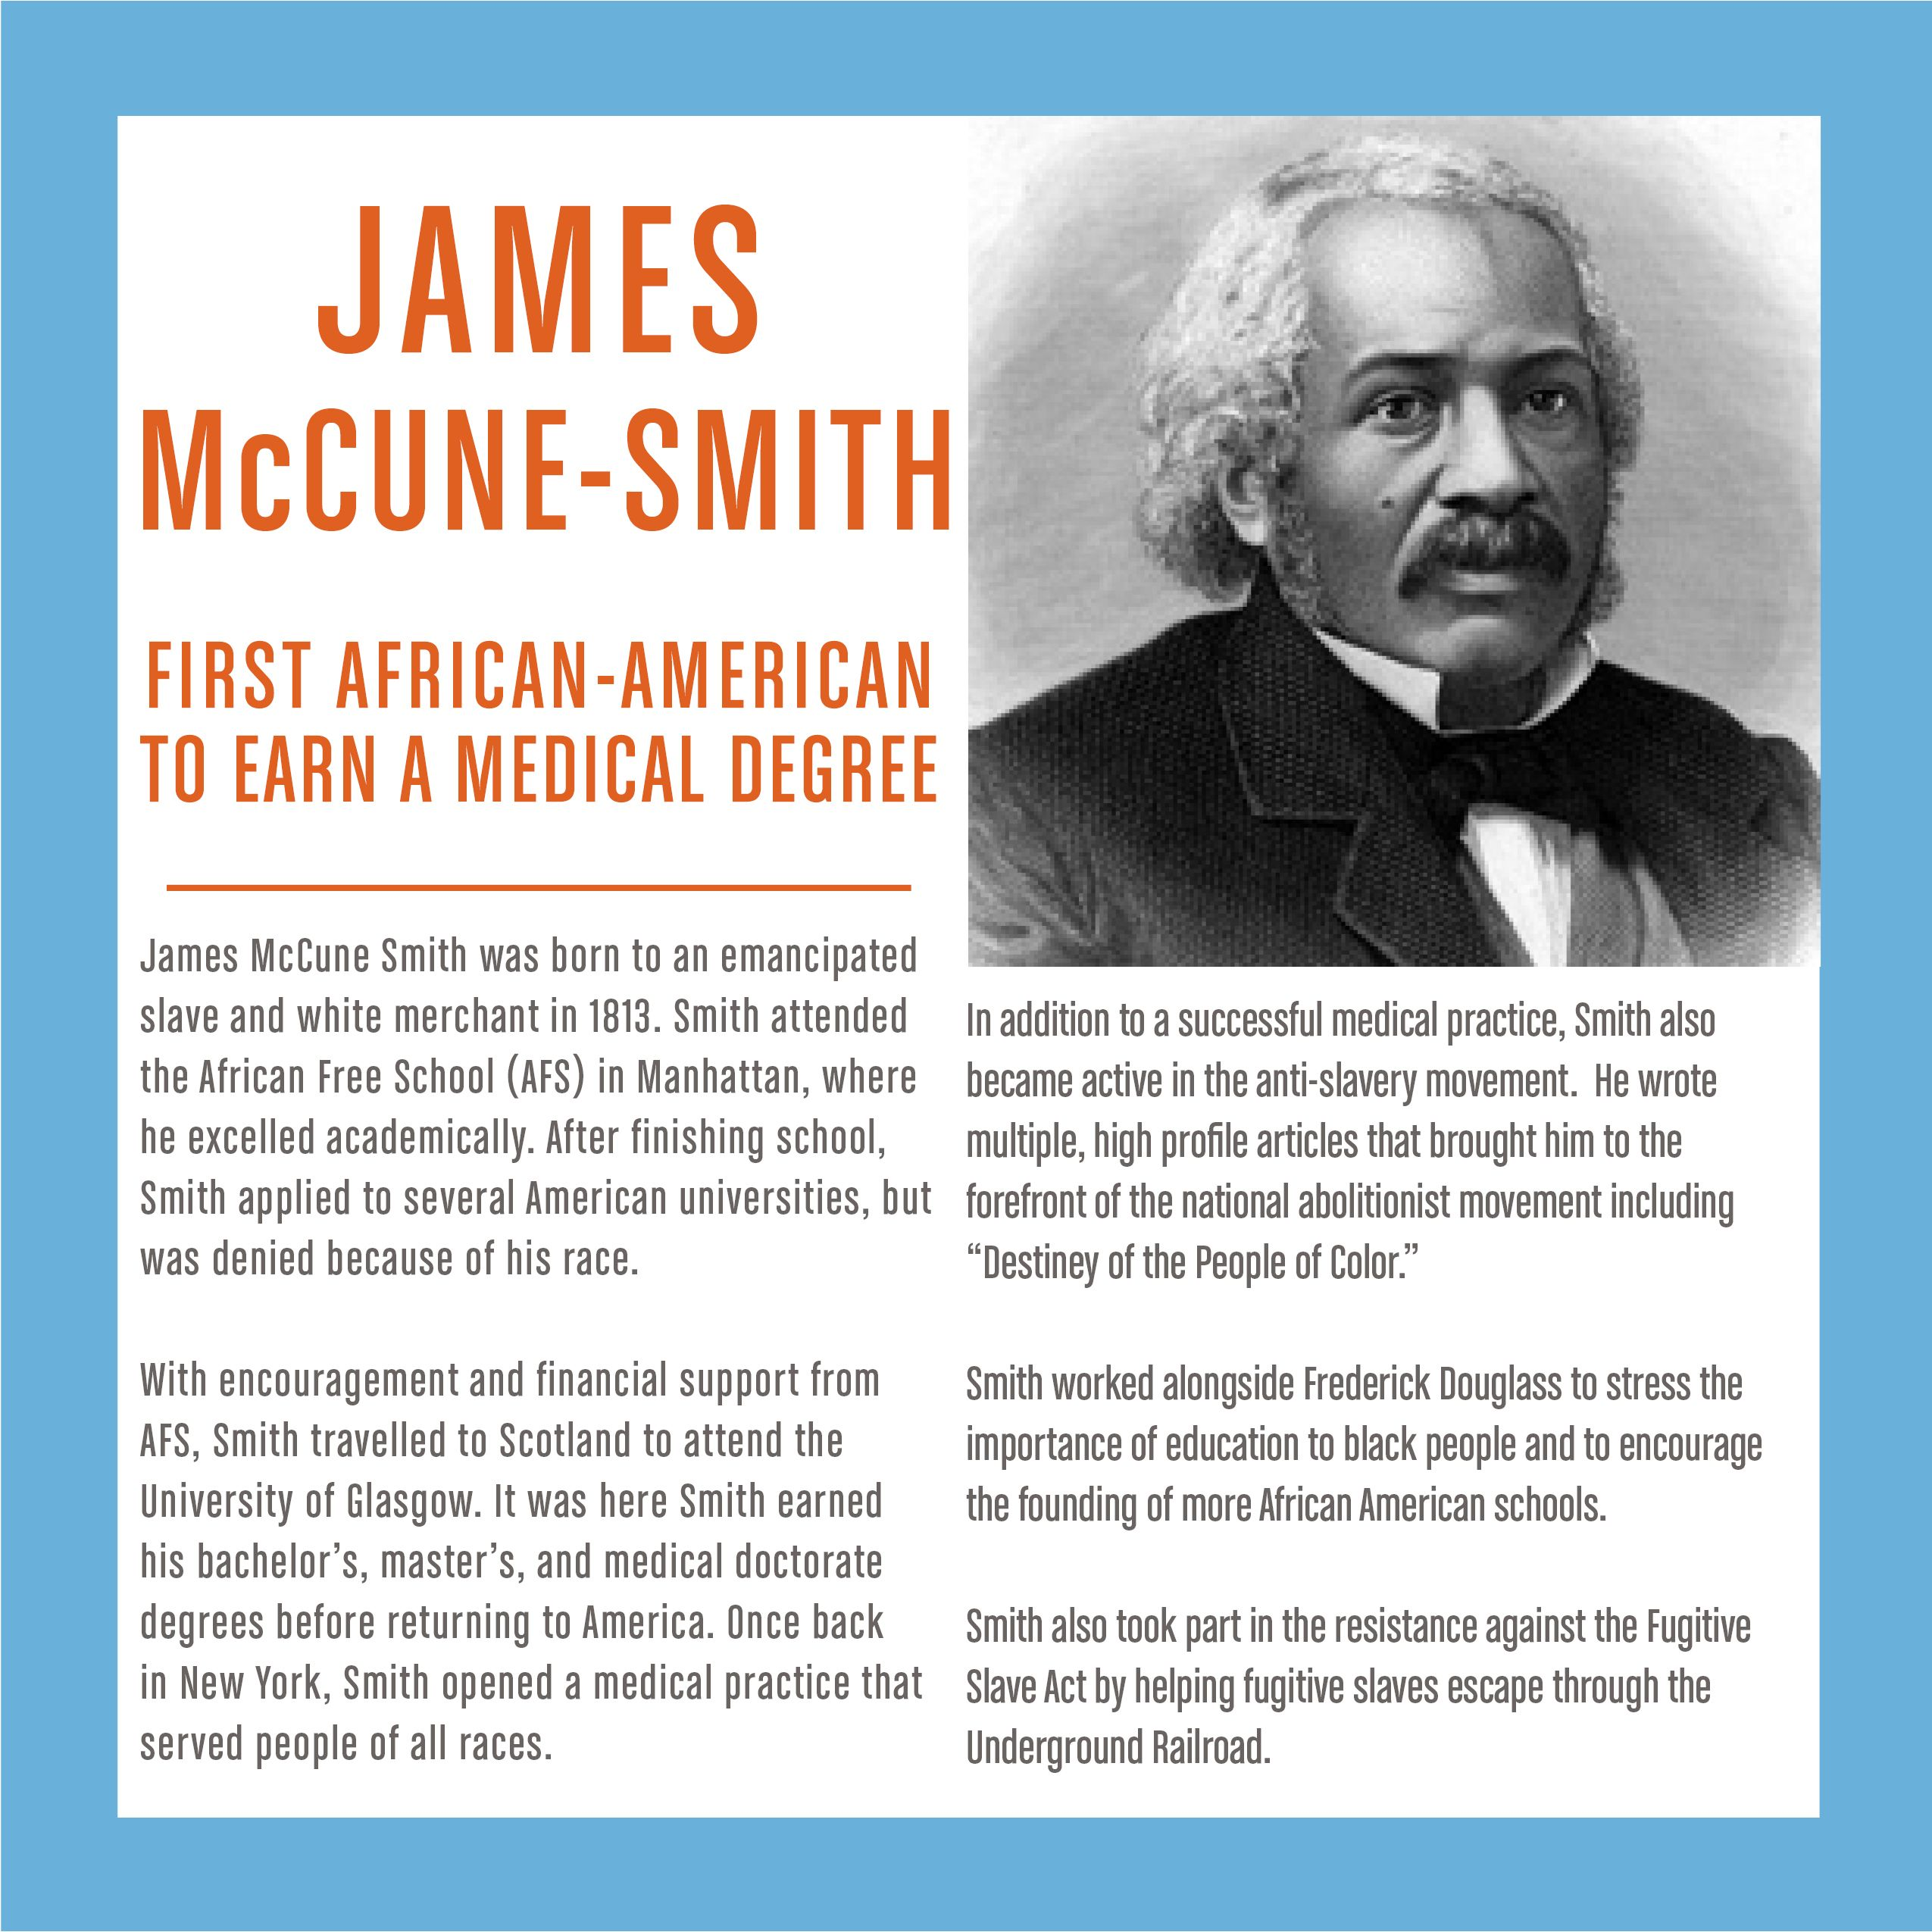 Washington STEM: James McCune-Smith: First African